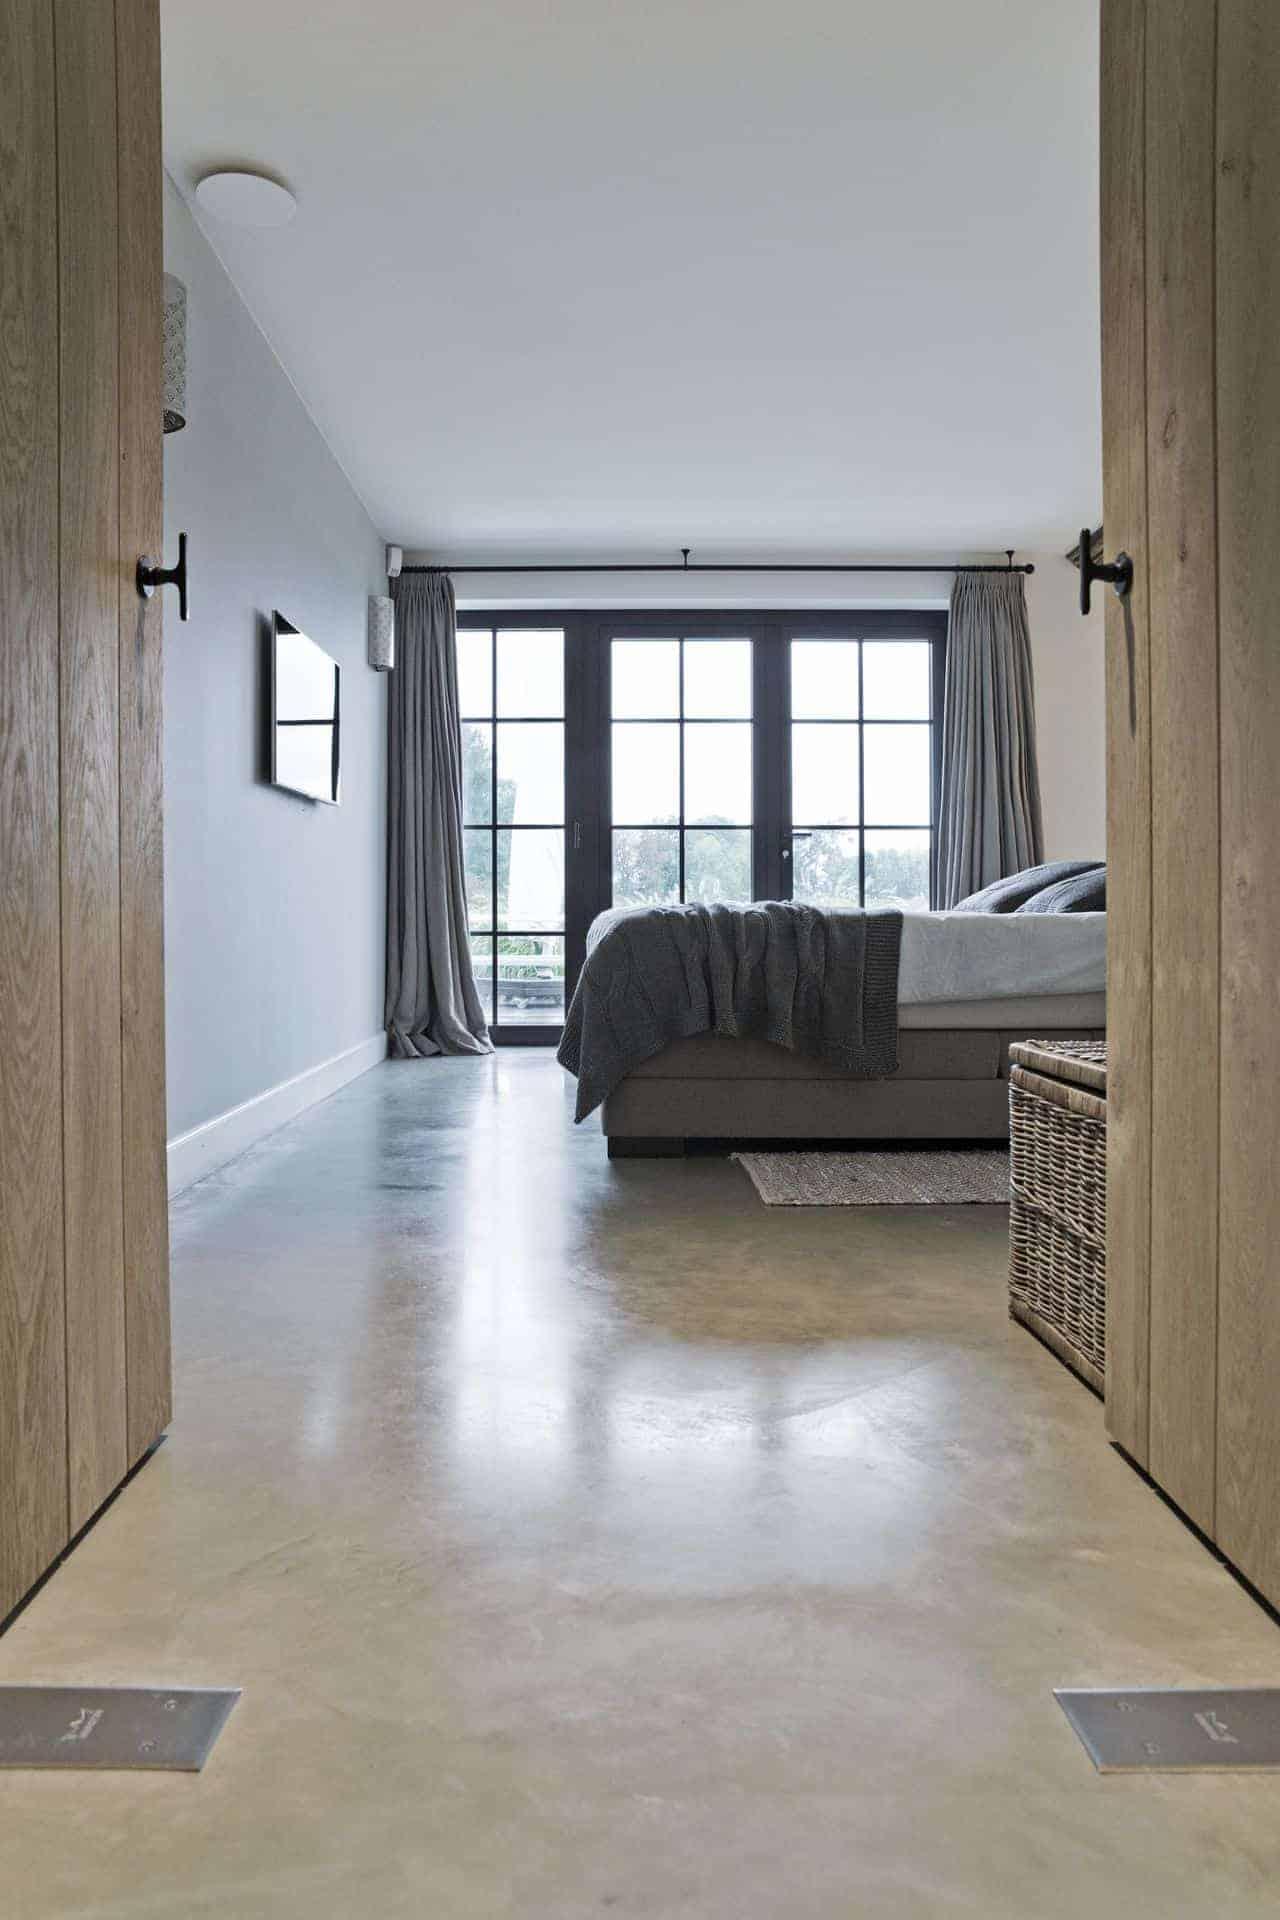 slaapkamer met betonvloer